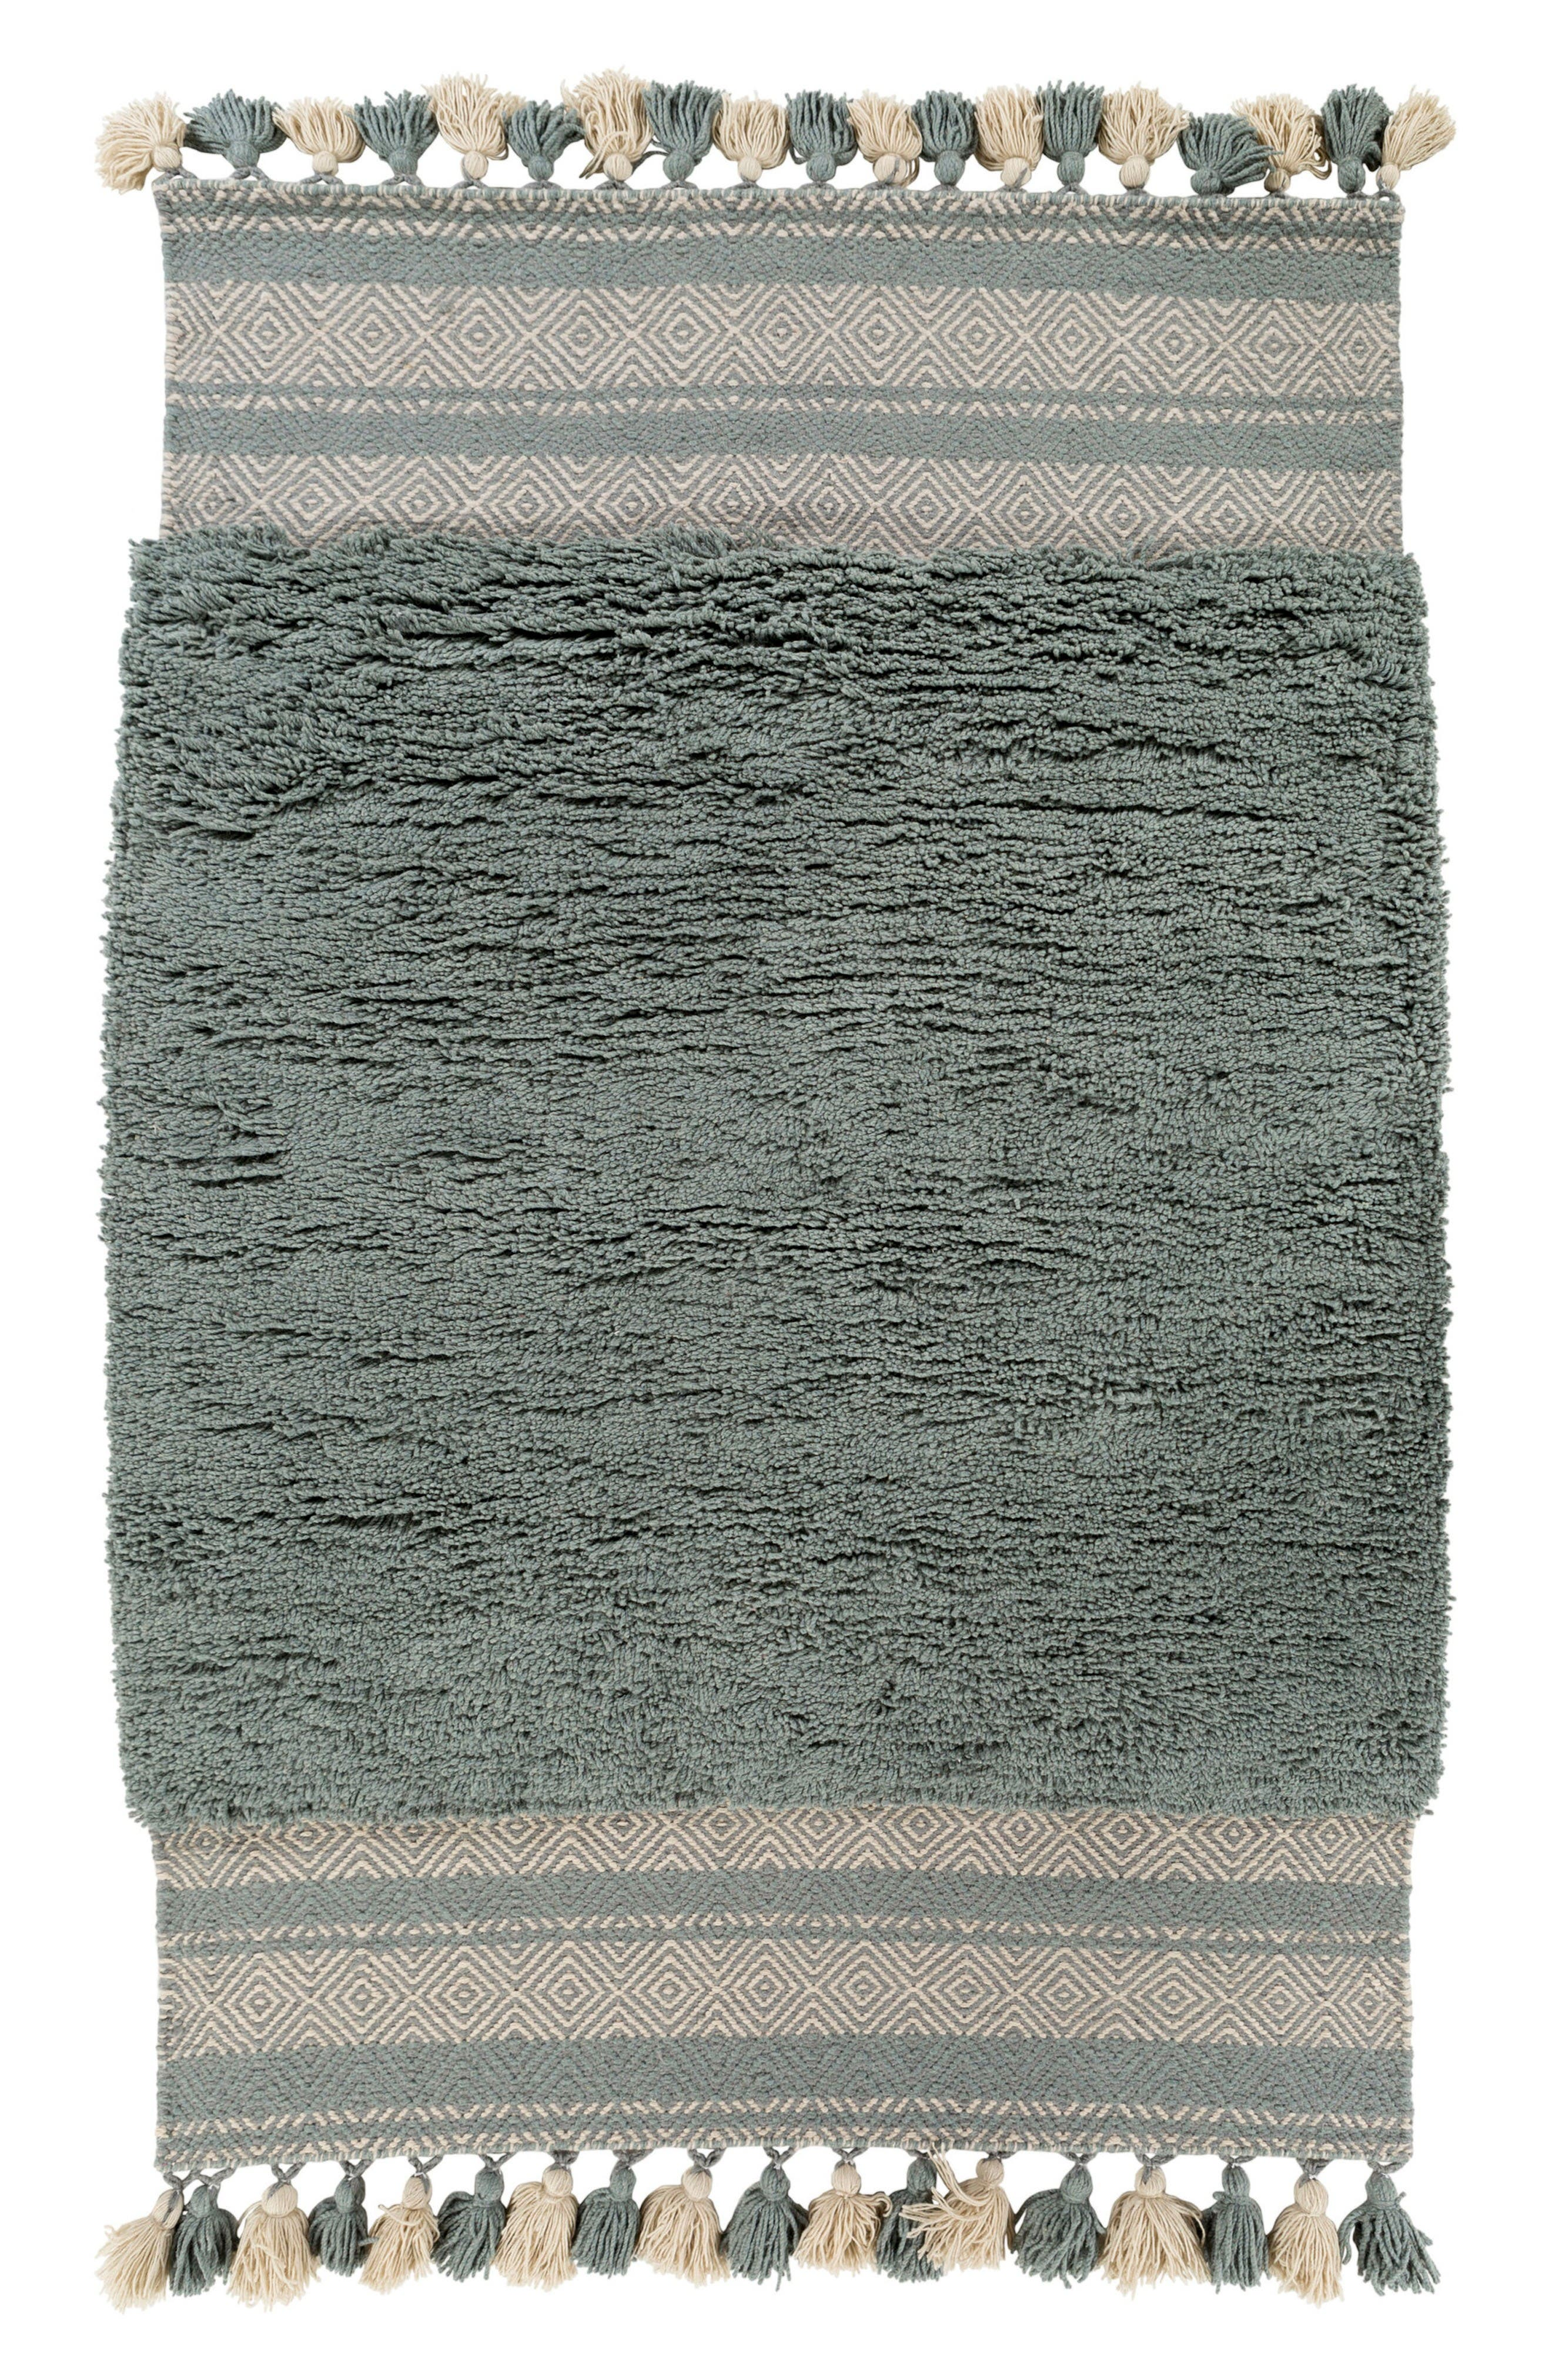 Korva Modern Handwoven Rug,                         Main,                         color, Teal